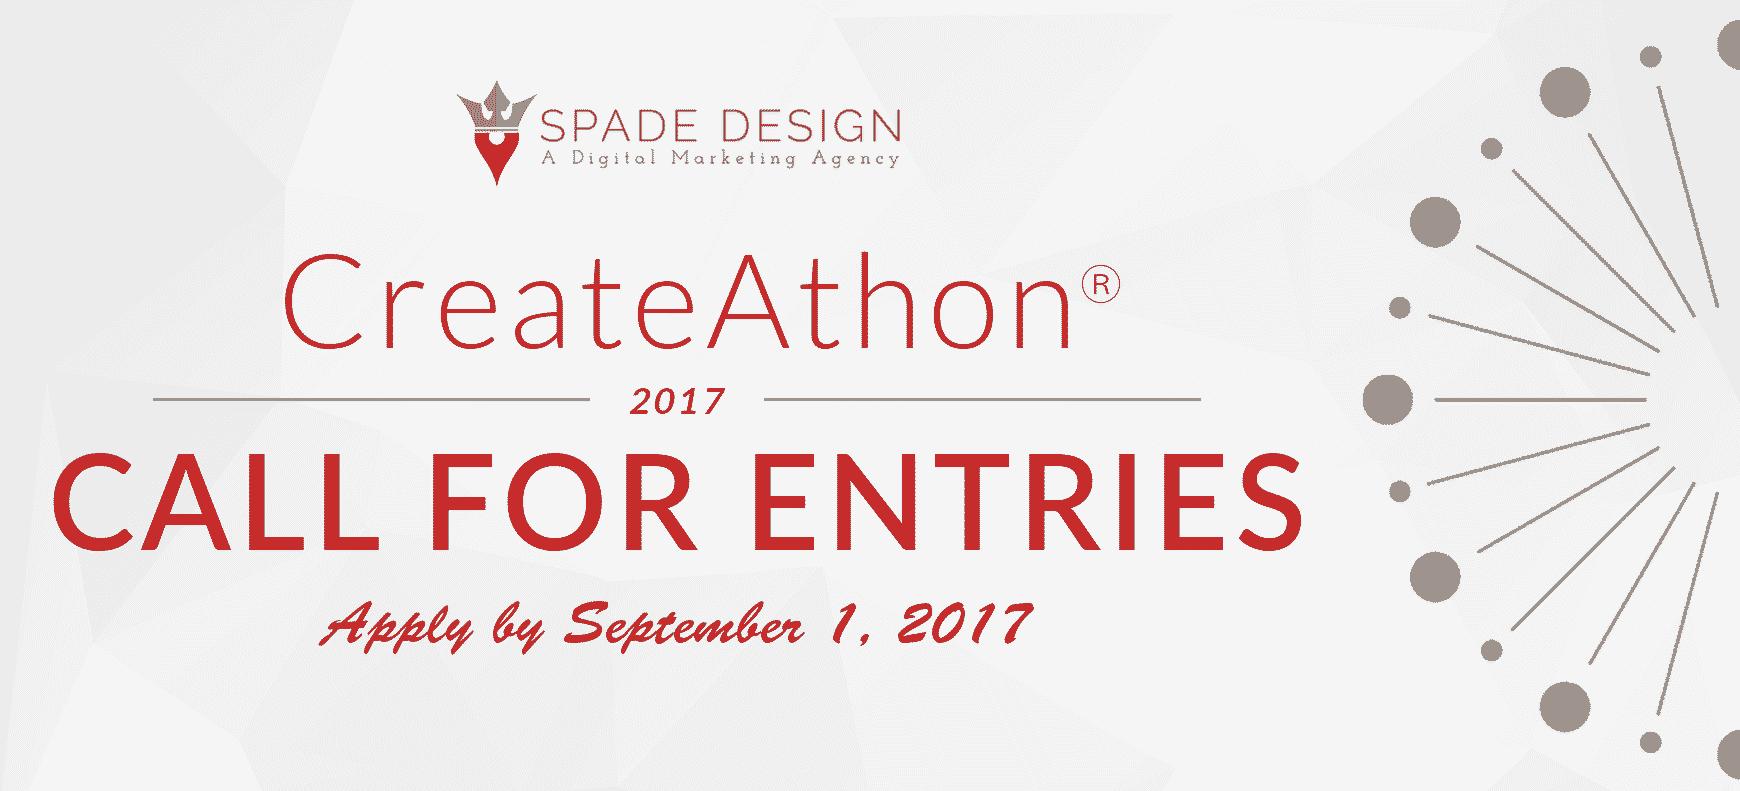 createathon2017-call-for-entries